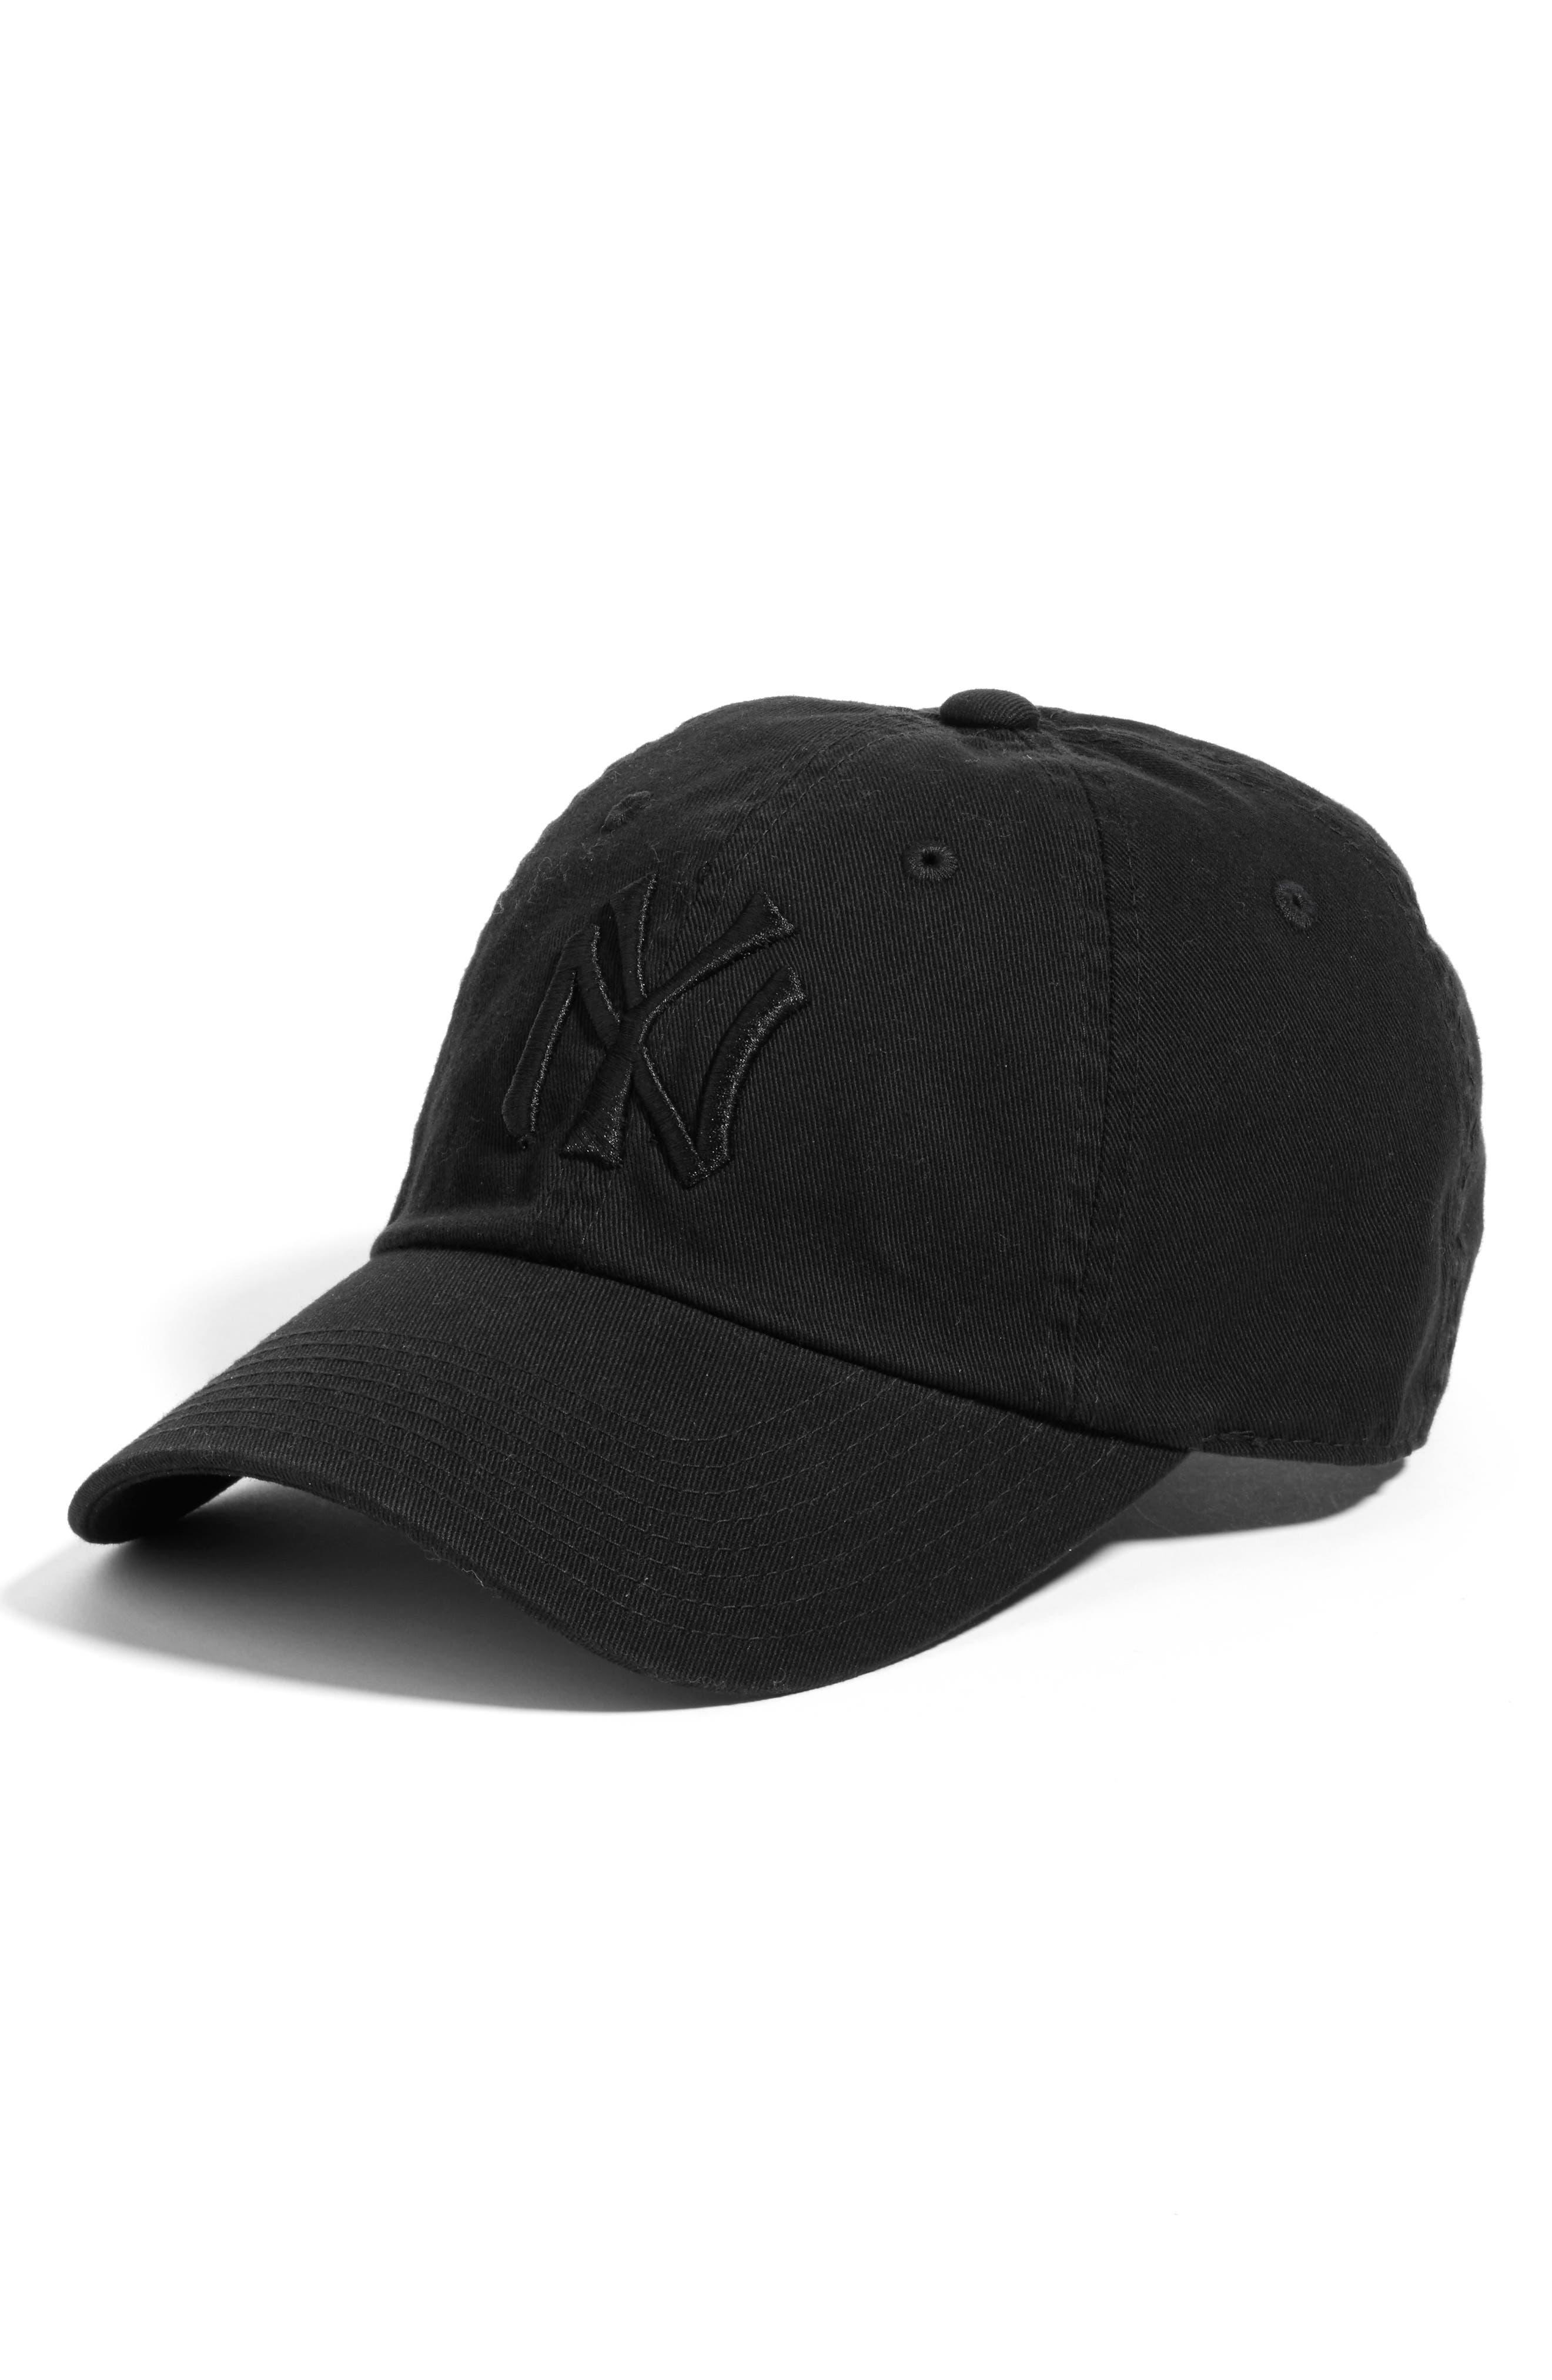 Ballpark - New York Yankees Baseball Cap,                             Main thumbnail 1, color,                             Black